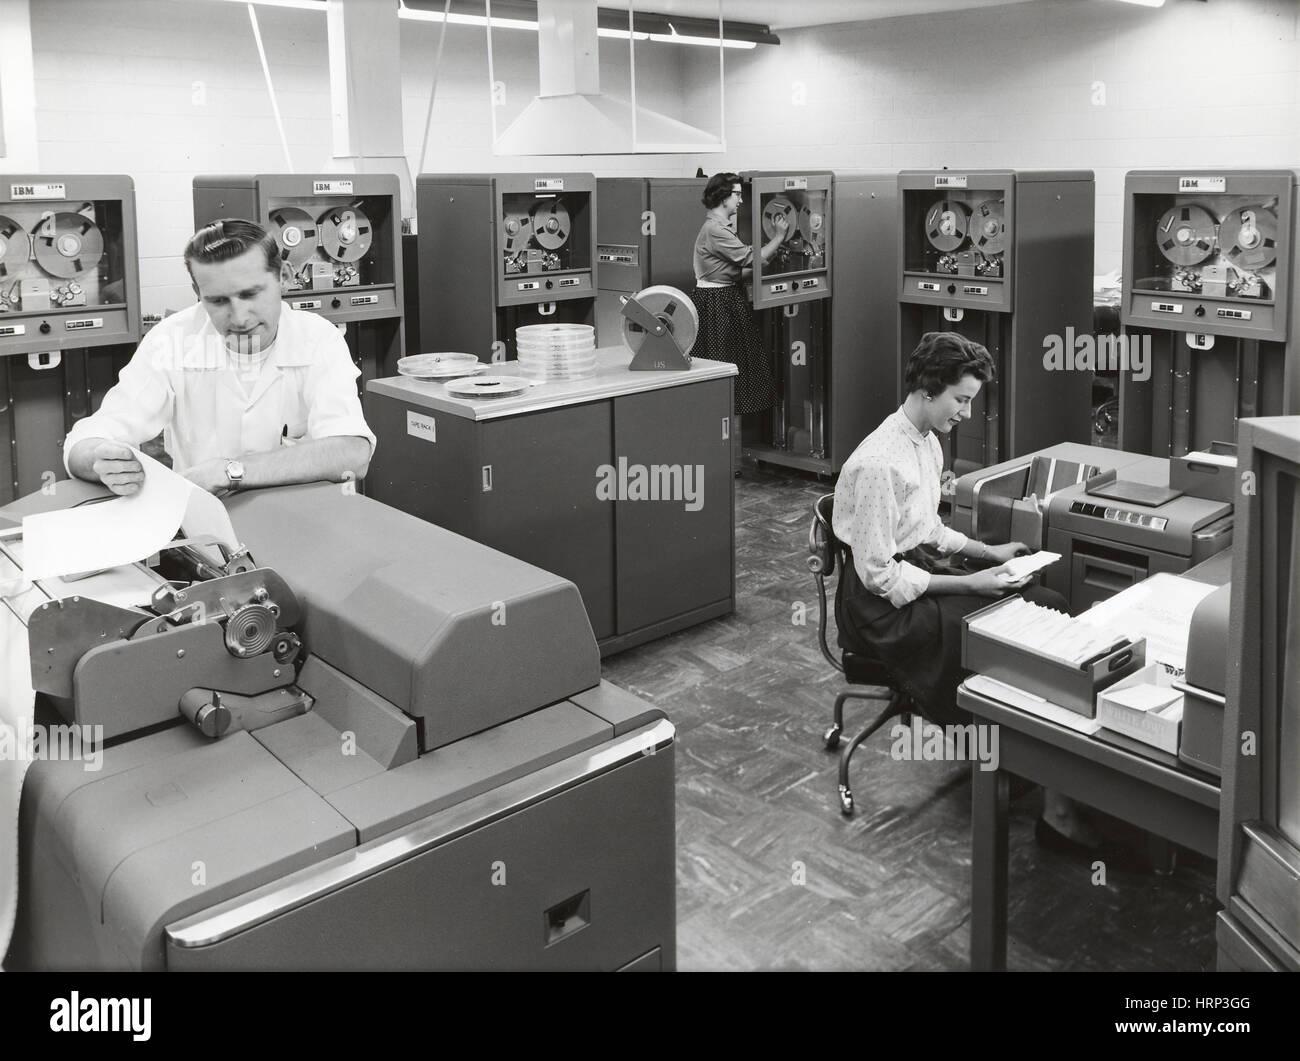 IBM 704 Computer, LLNL, 1950s - Stock Image